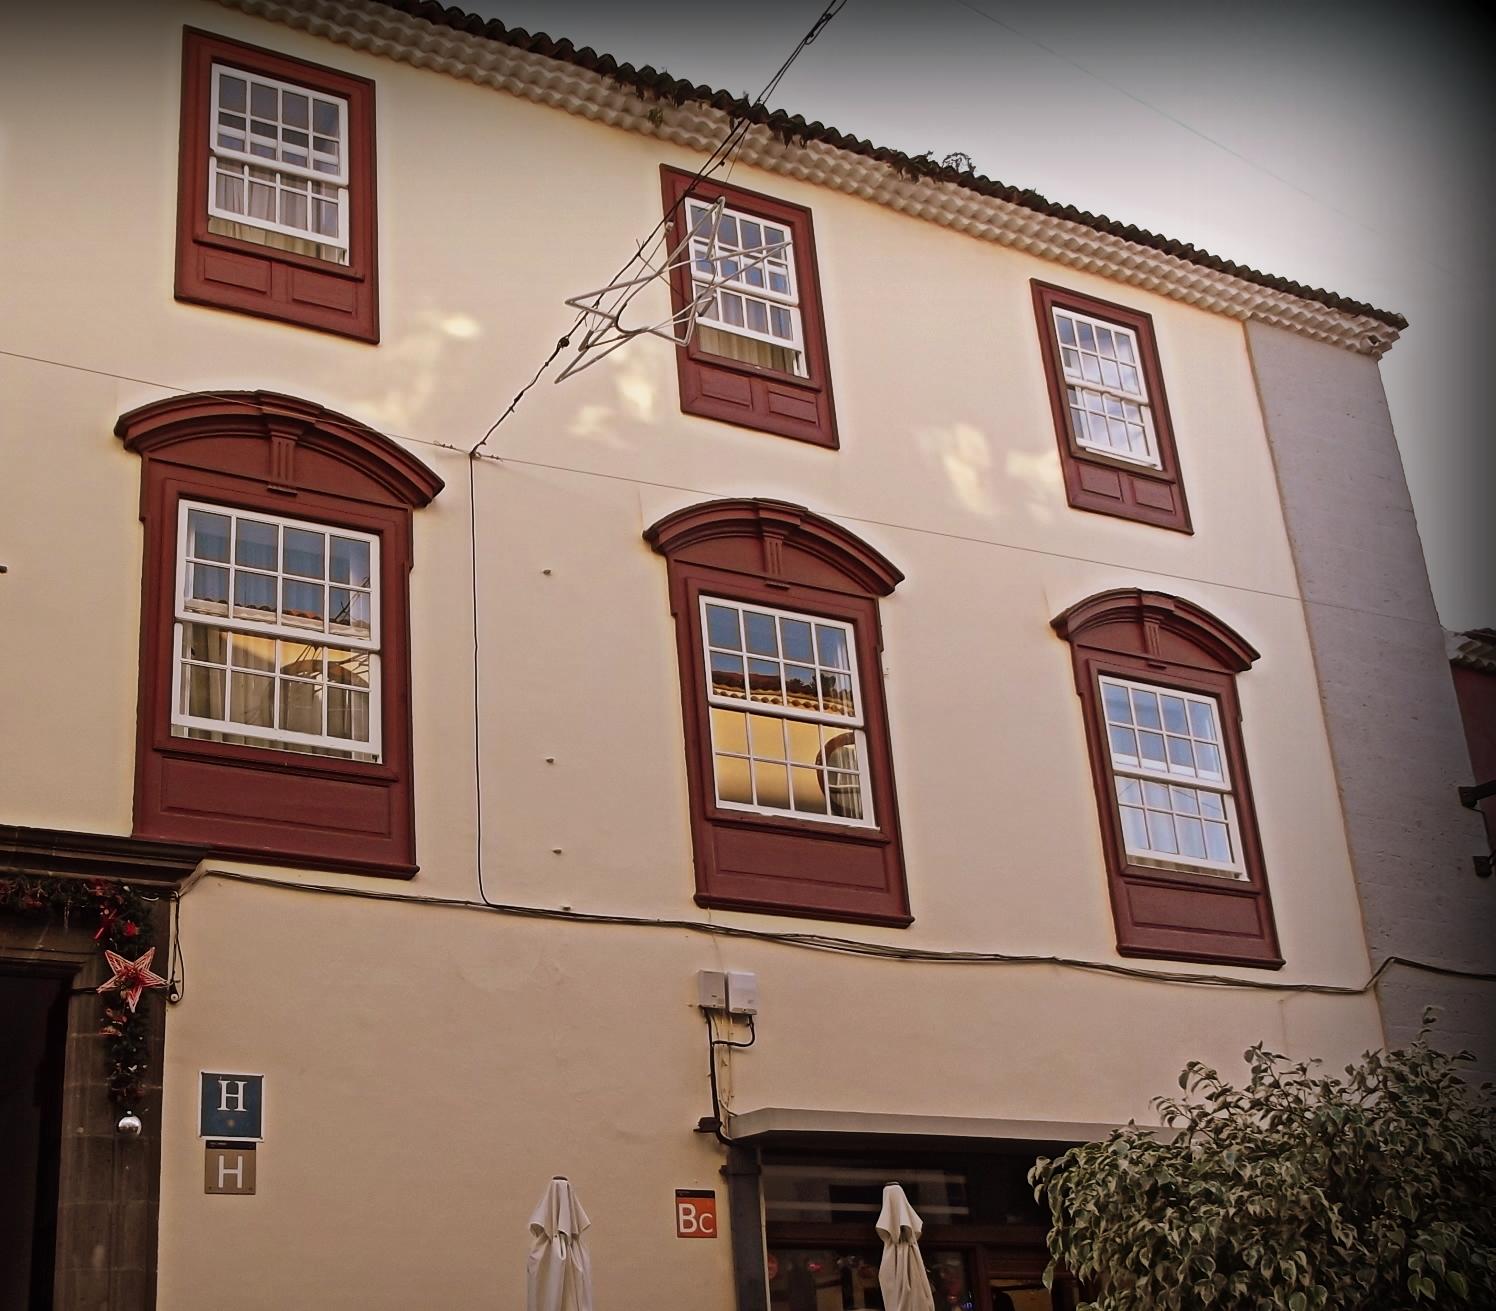 Casa de los Marqueses de Torrehermosa